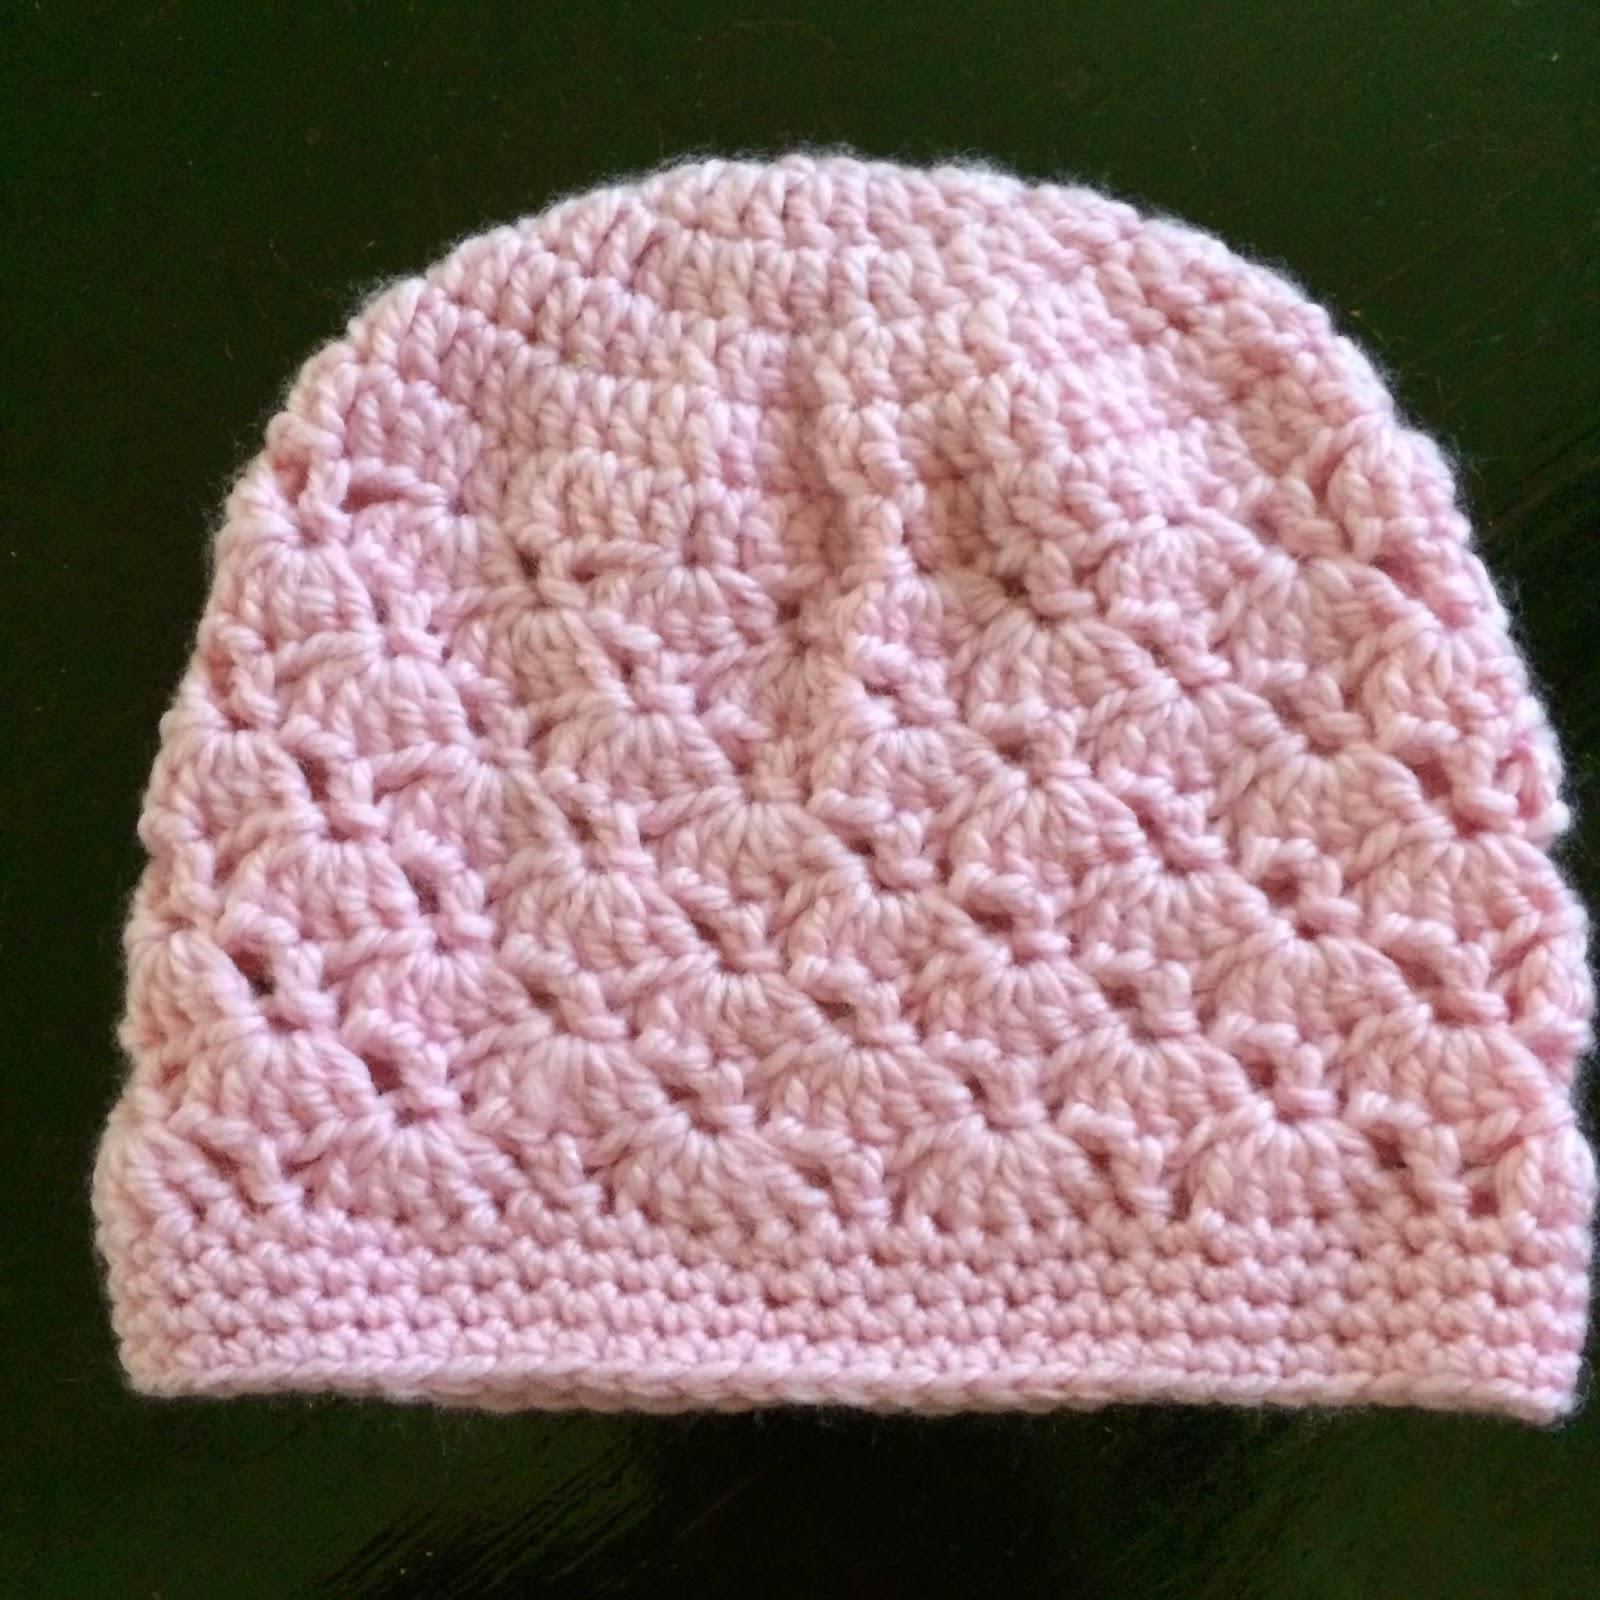 Crochet Chemo Cap 2 - Free Pattern Not My Nanas Crochet!